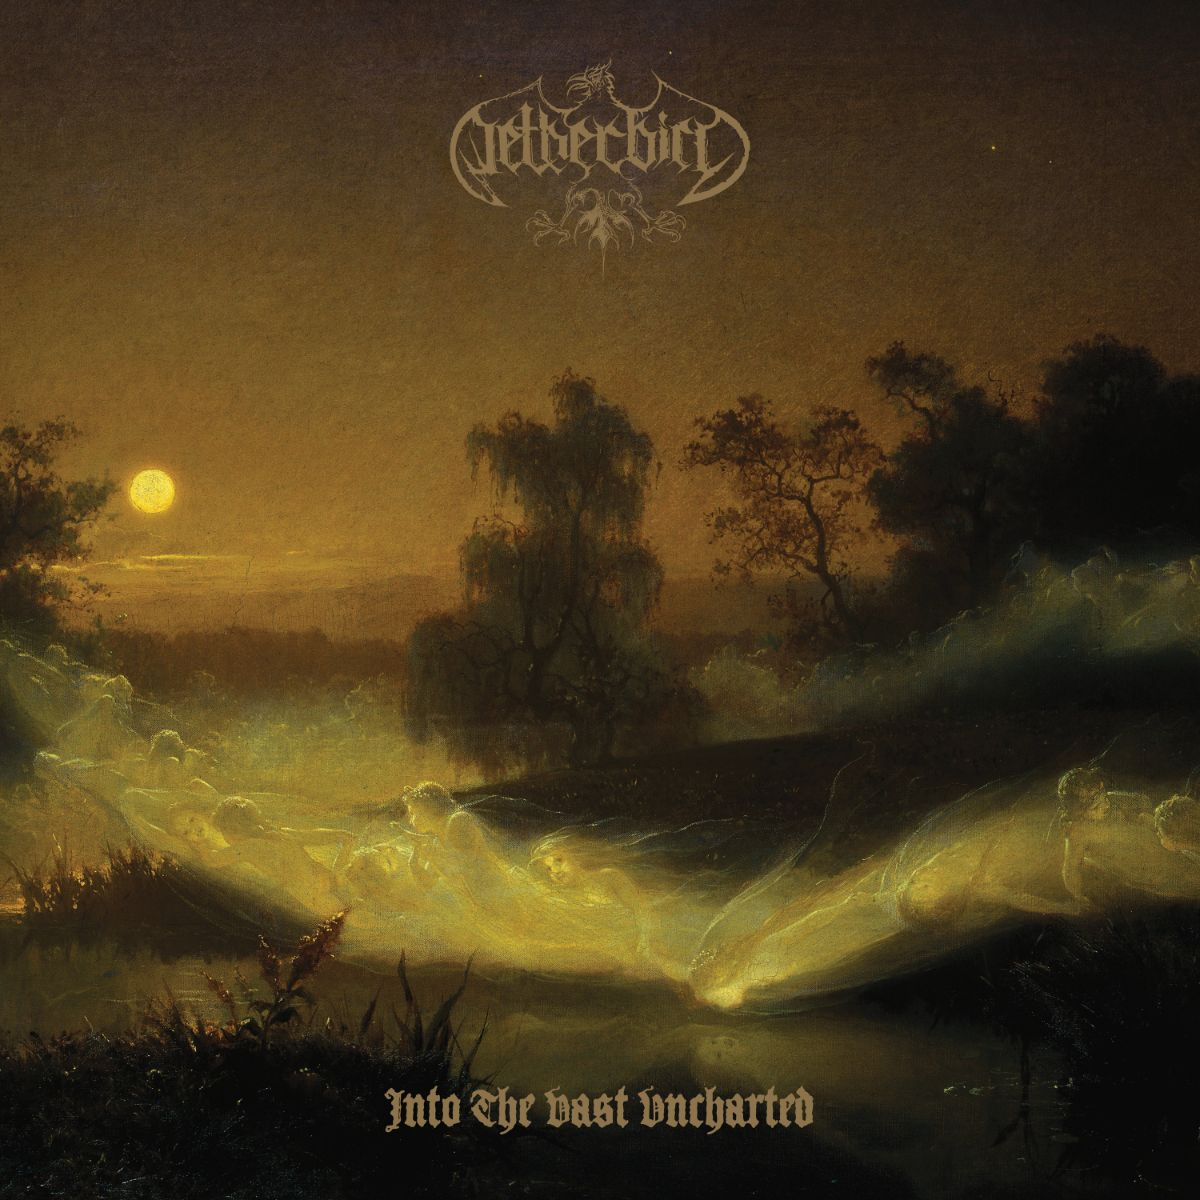 Netherbird Announces A New Album